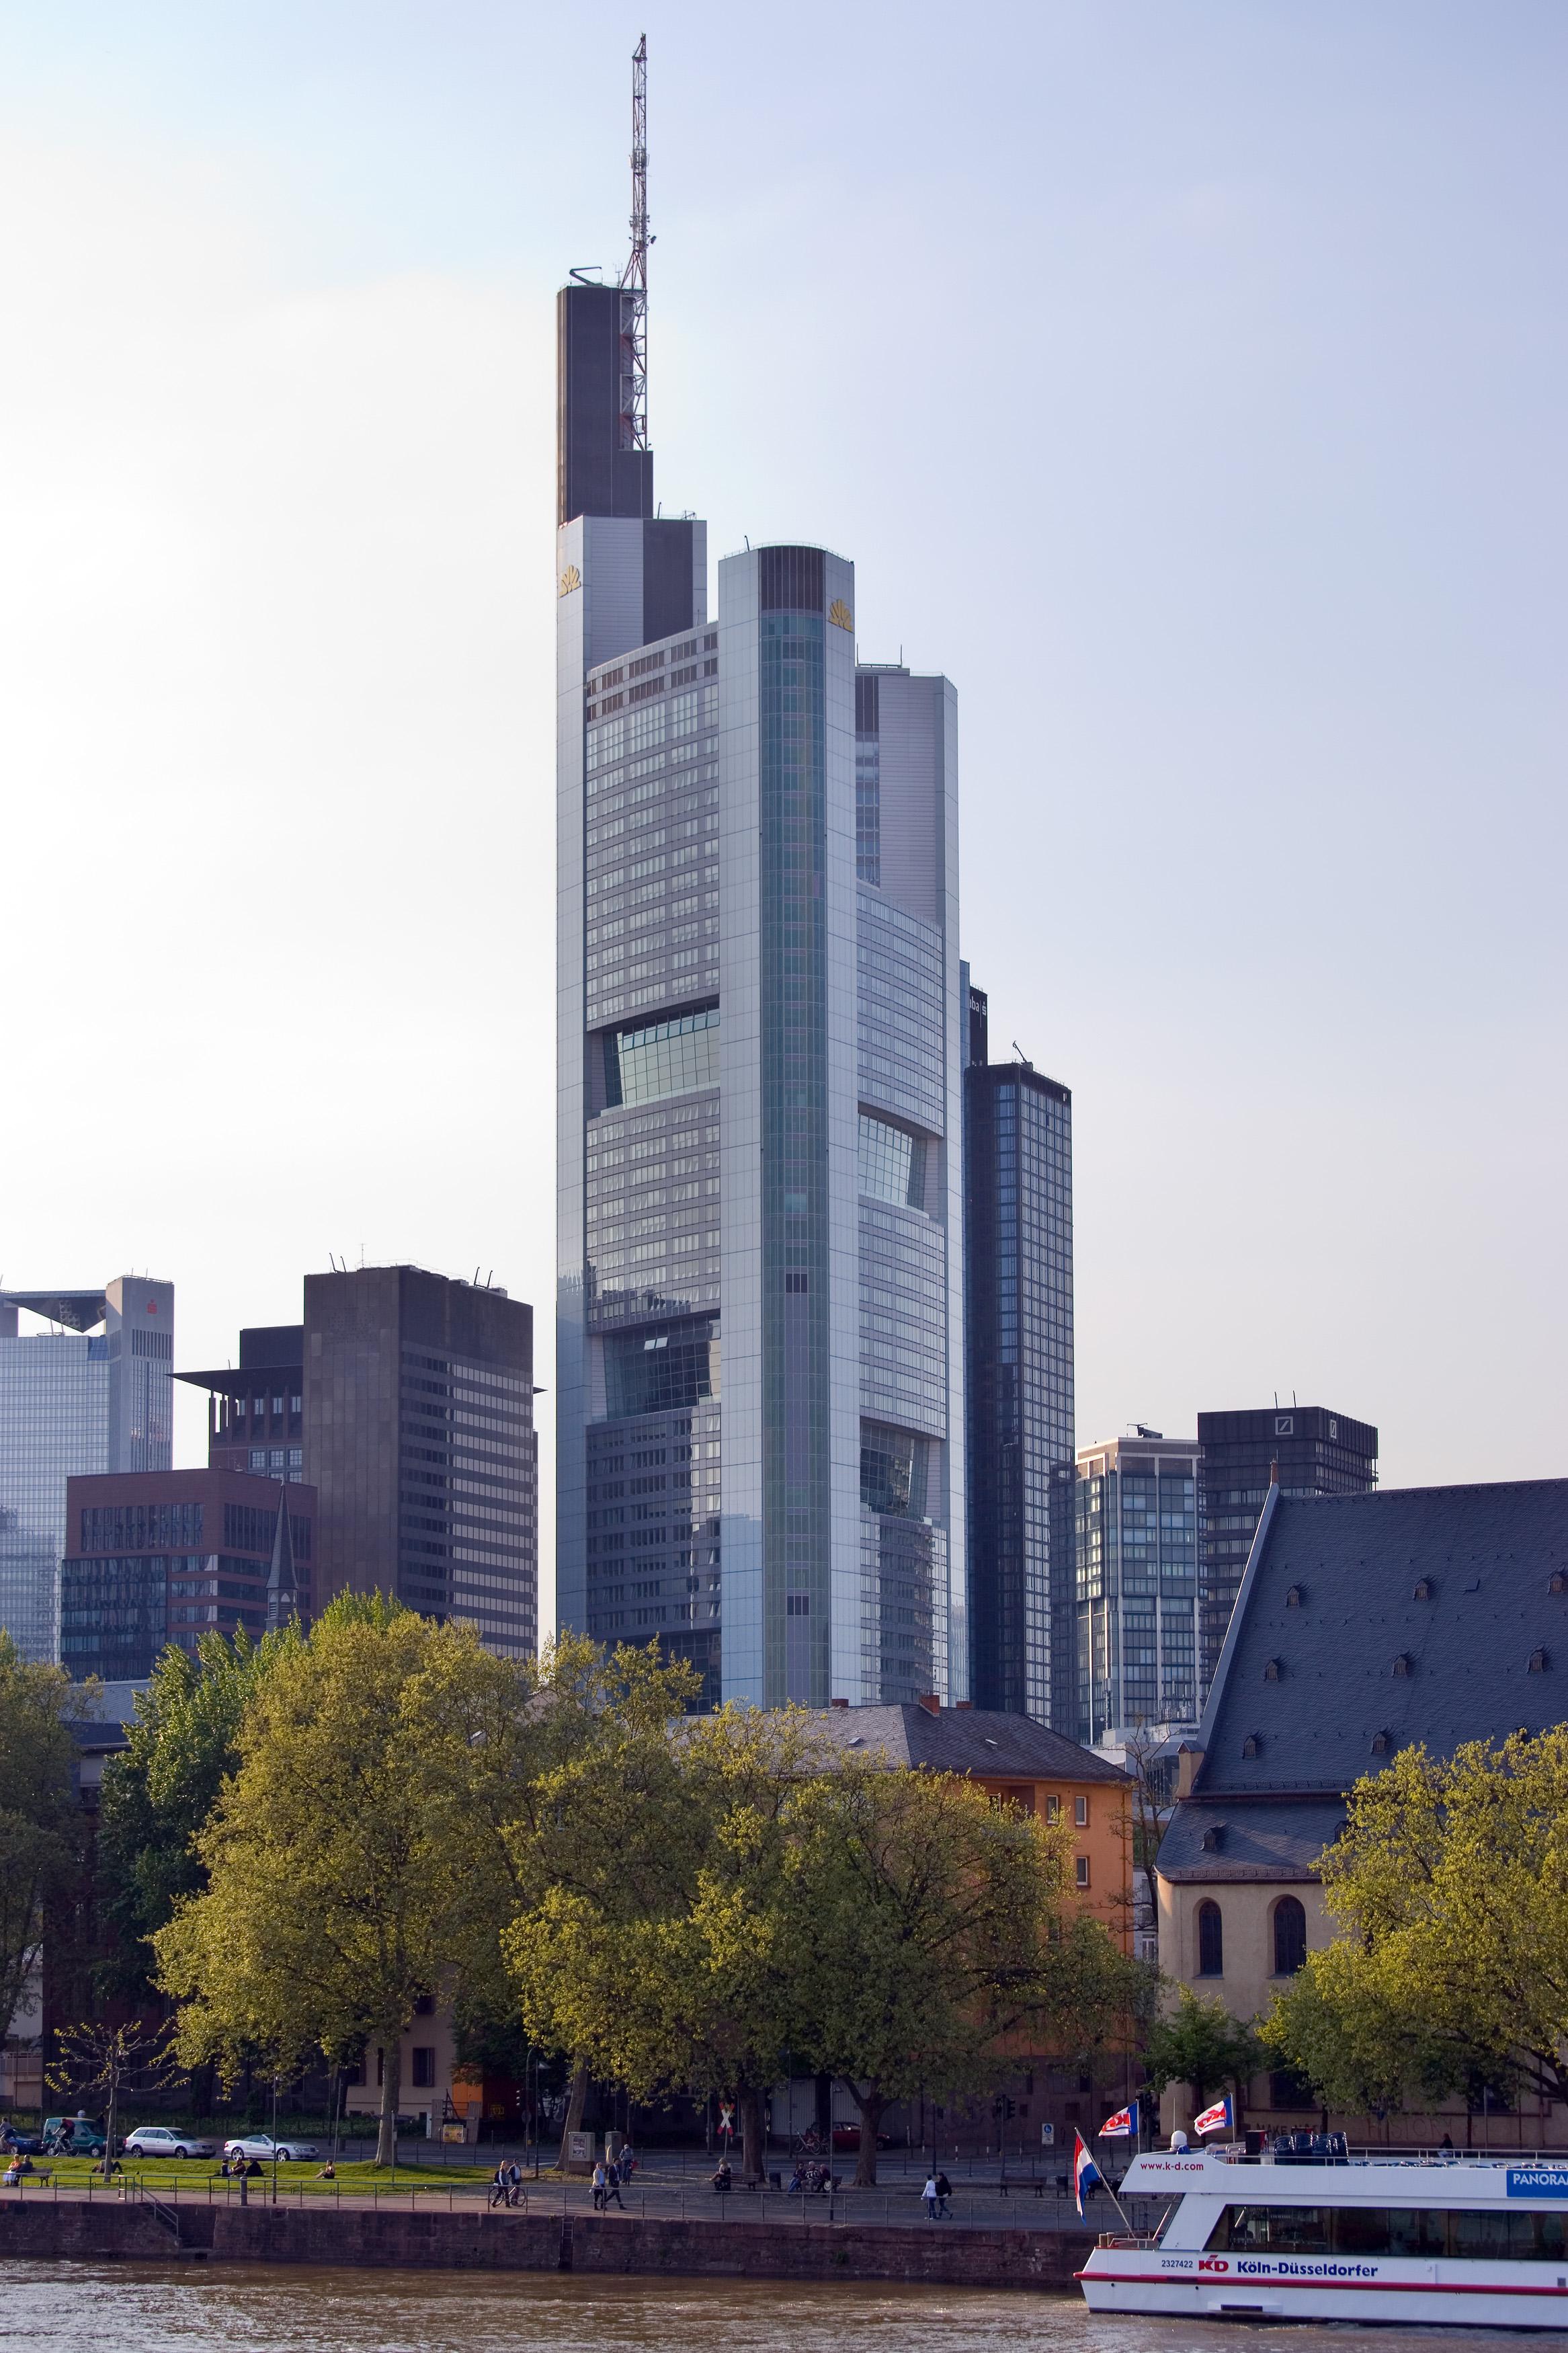 https://i0.wp.com/upload.wikimedia.org/wikipedia/commons/0/0c/Frankfurt_Am_Main-Commerzbank_Tower-Ansicht_vom_Eisernen_Steg.jpg